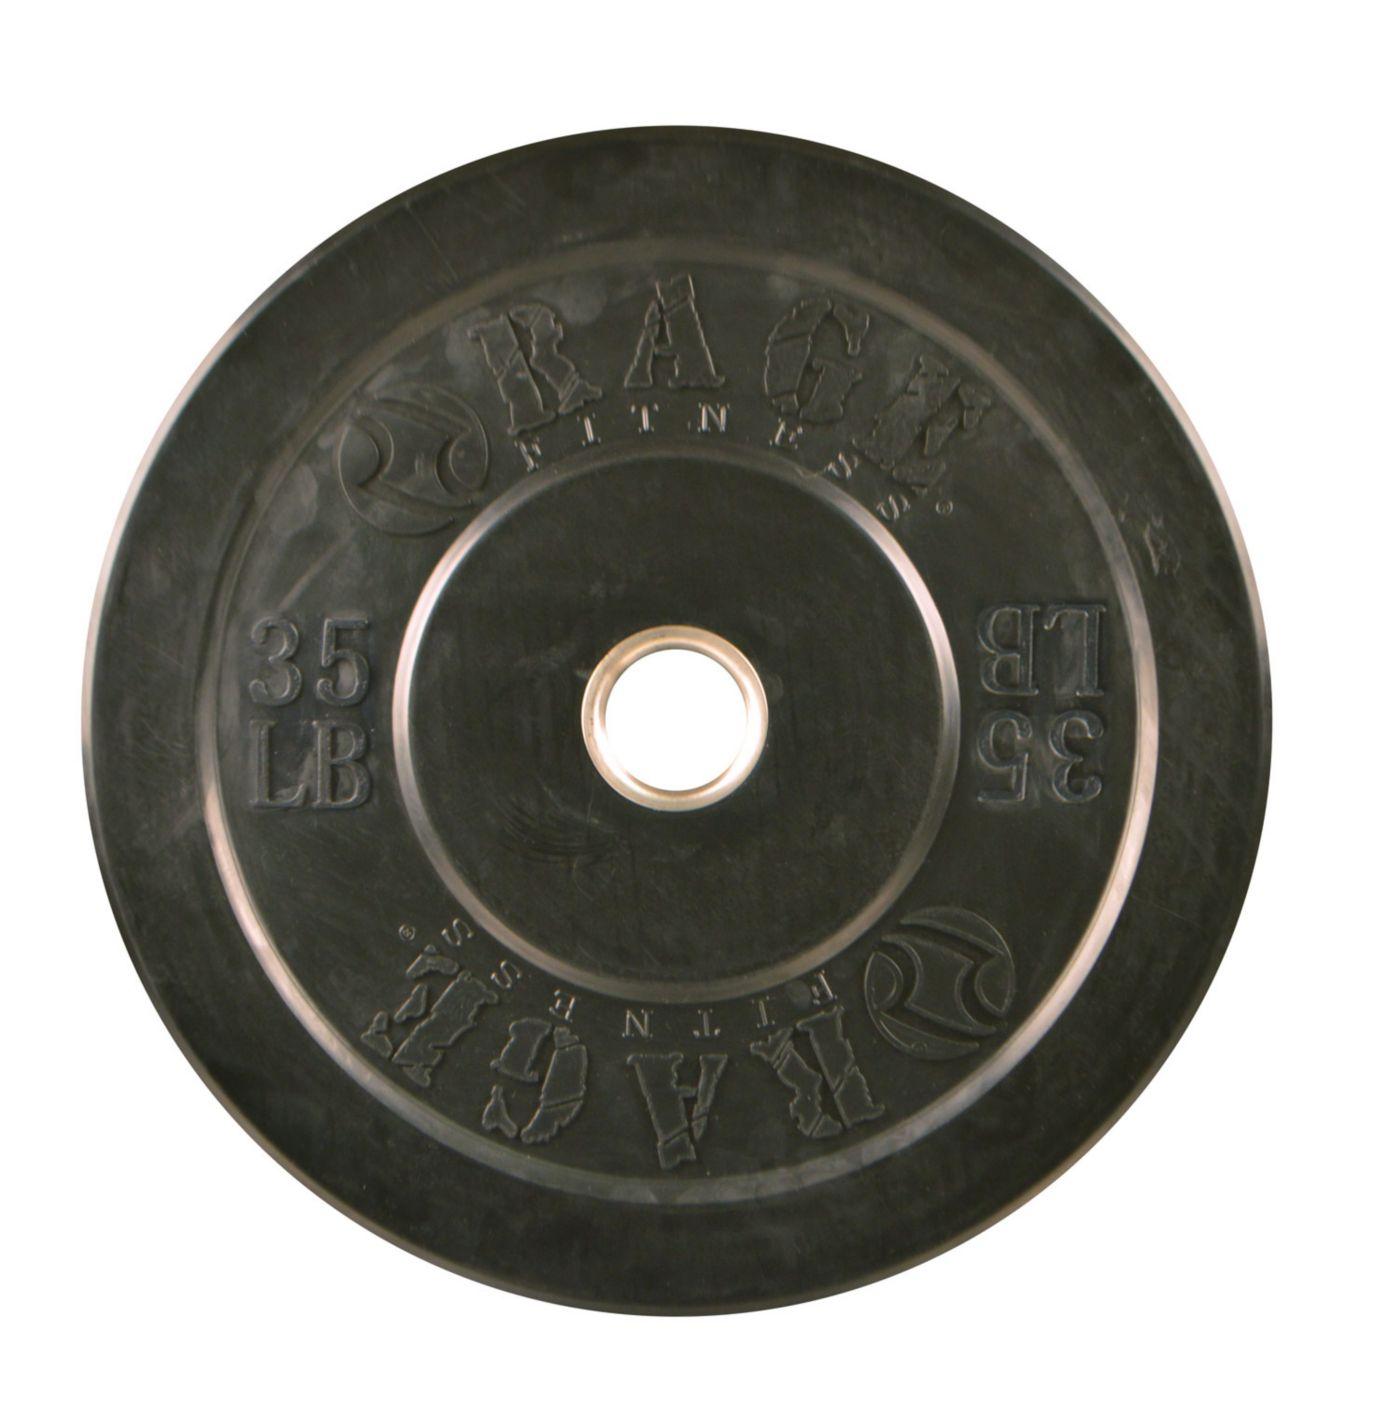 RAGE 35 lb Olympic Bumper Plate